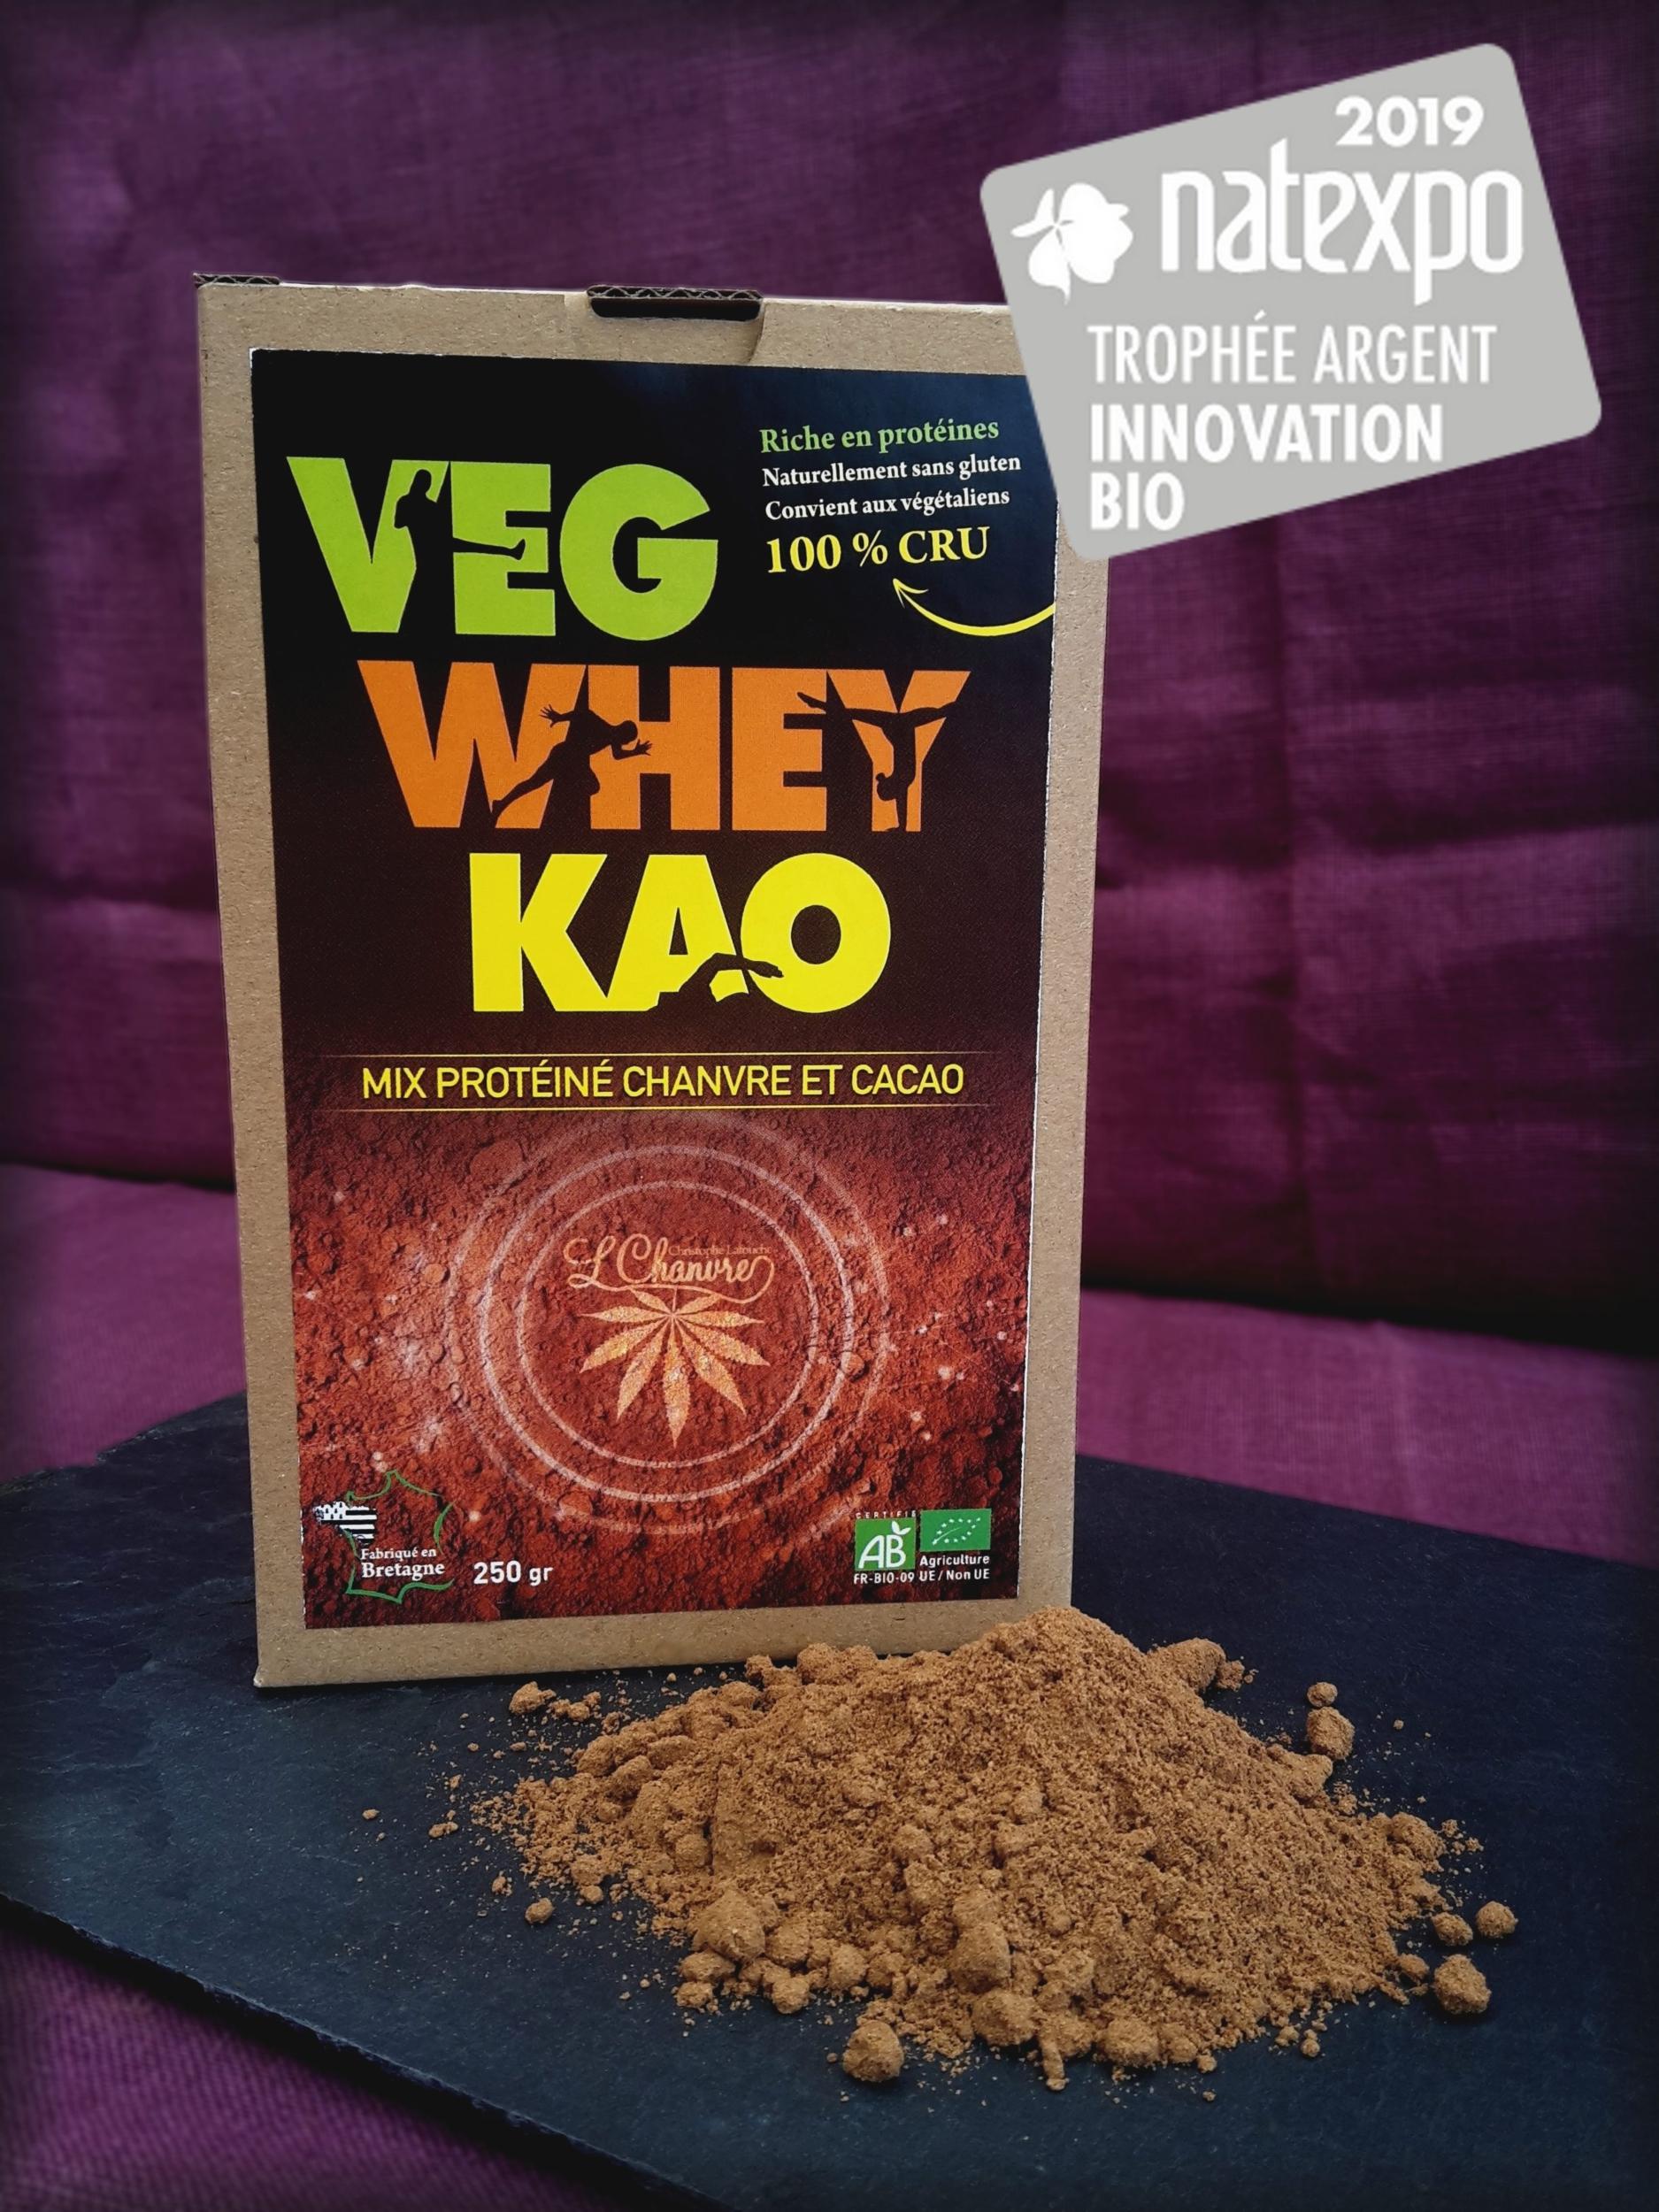 Mix protéiné chanvre & cacao Veg'Whey Kao